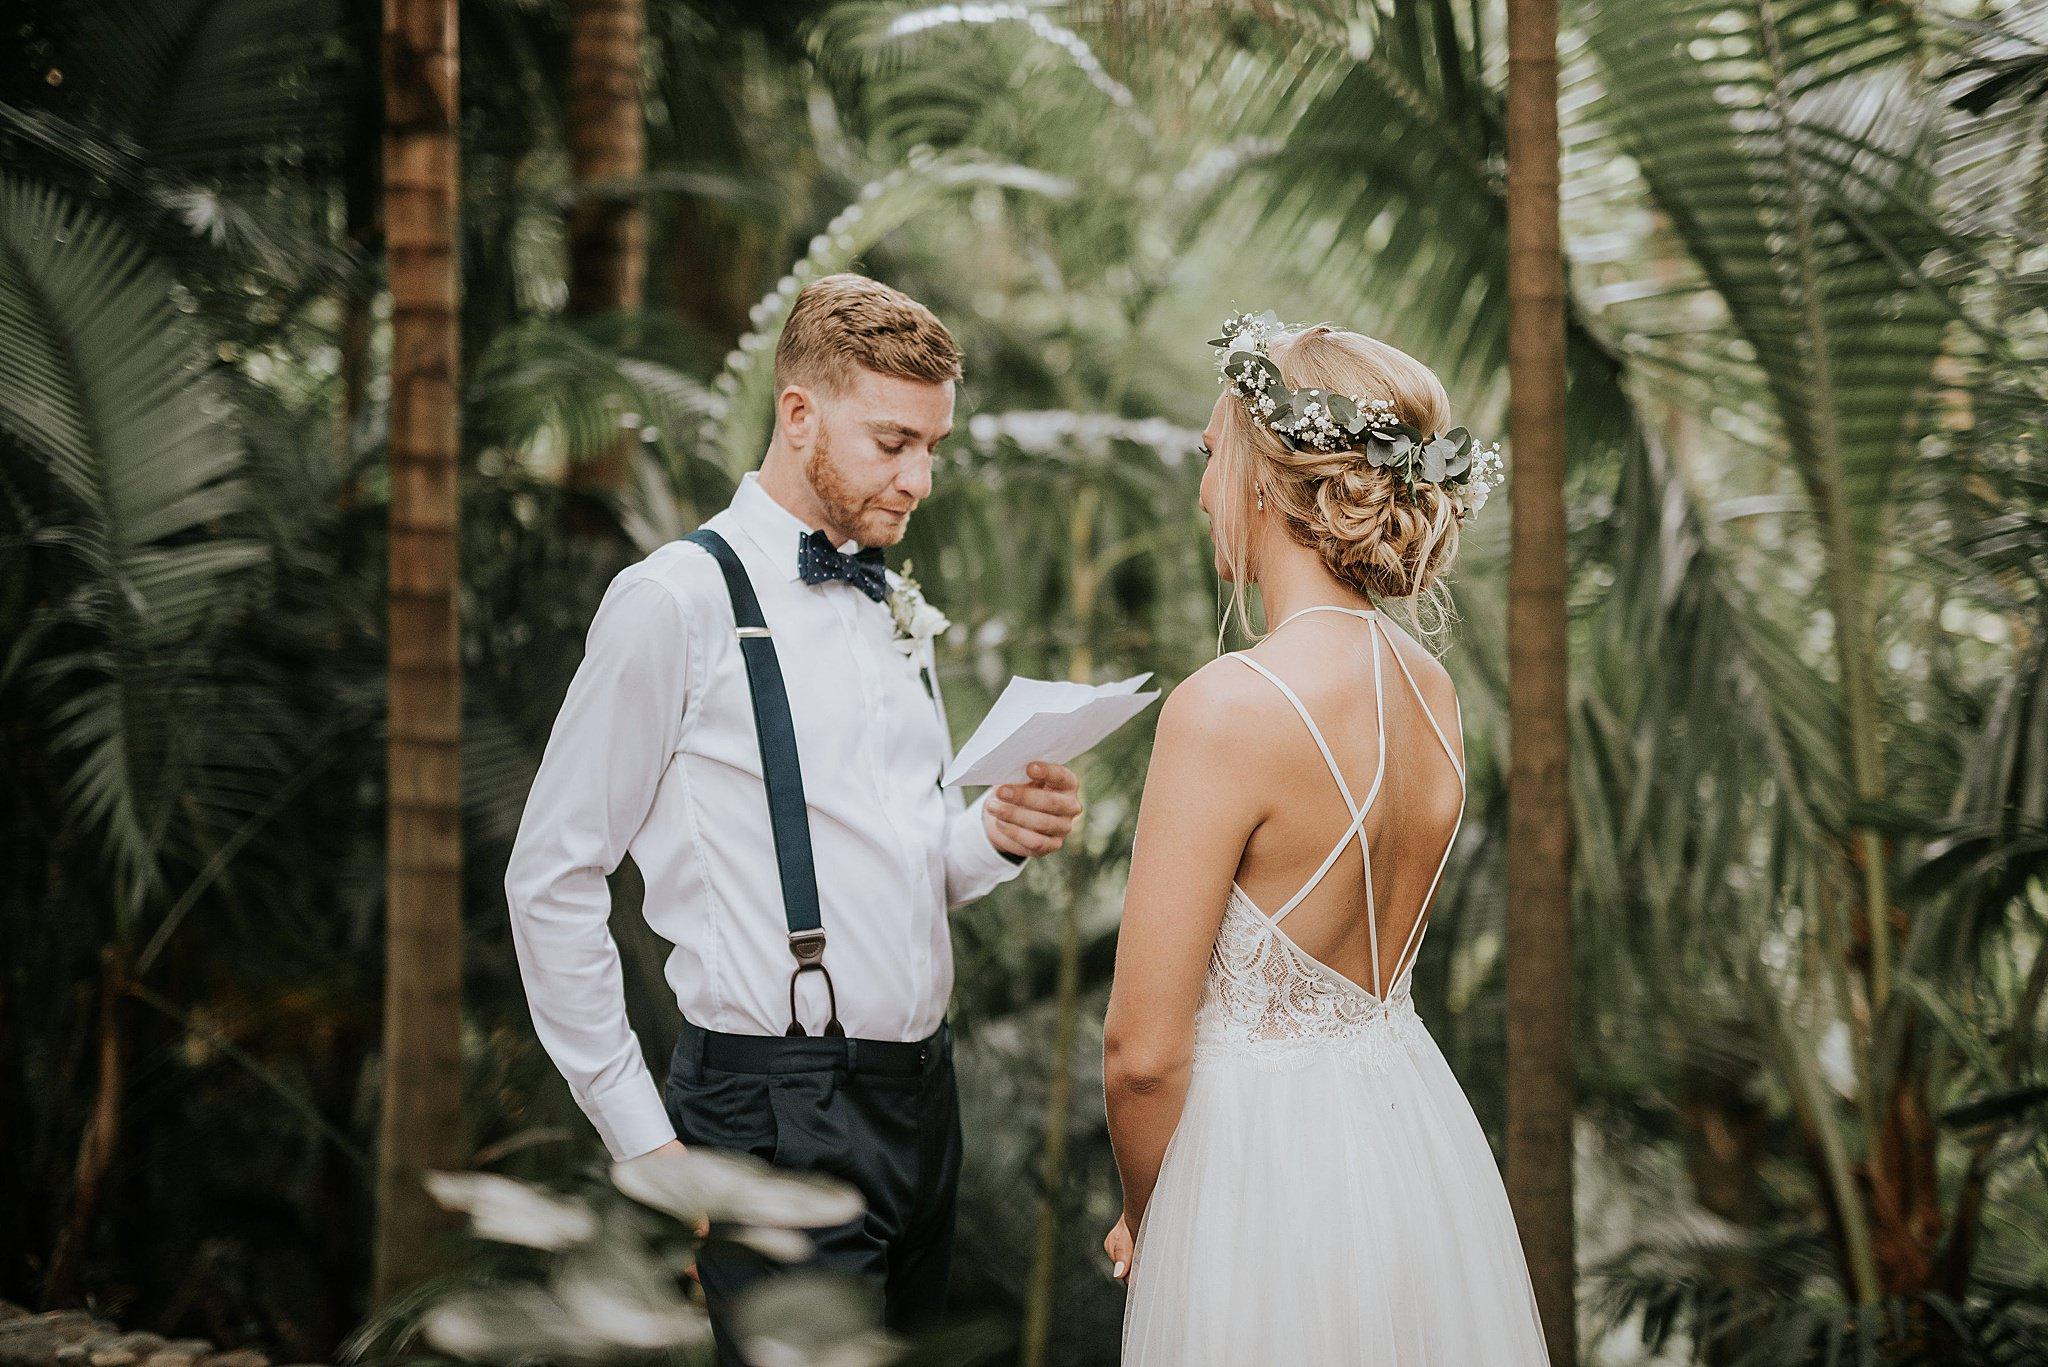 33Kelsey_jacob_beach_wedding_costa_rica_photography_0033.jpg